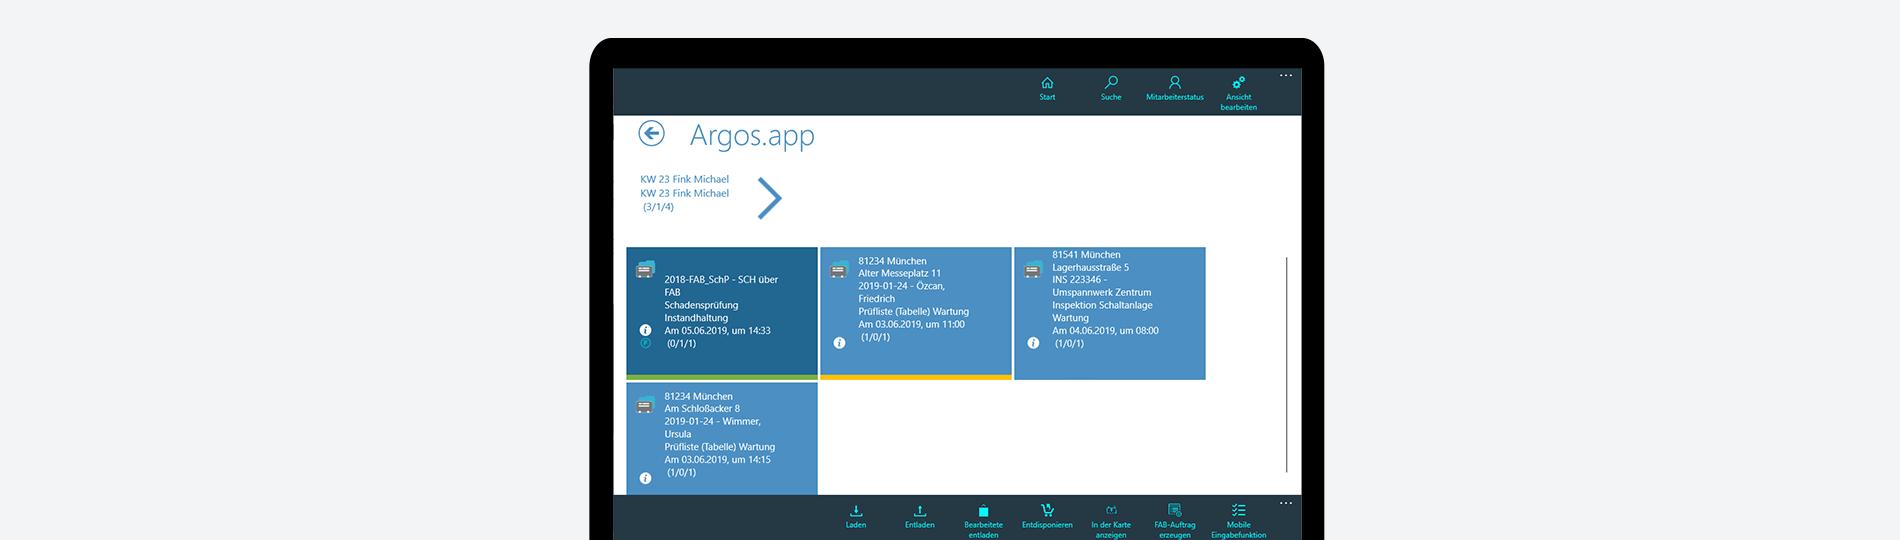 argos.app_Slide2